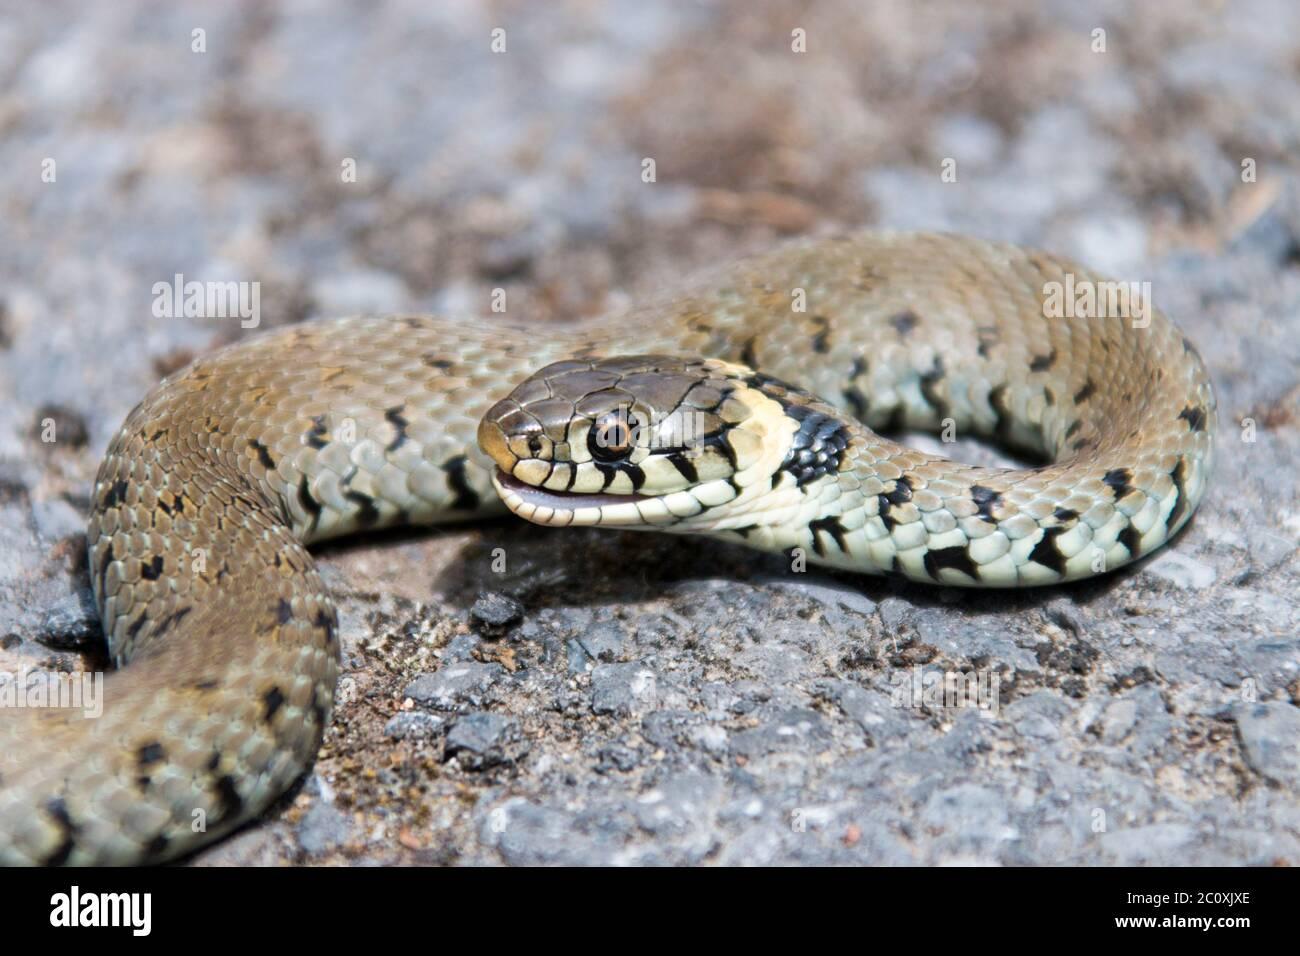 Serpent à herbe, Natrix natrix, attrapé par un chat. Banque D'Images